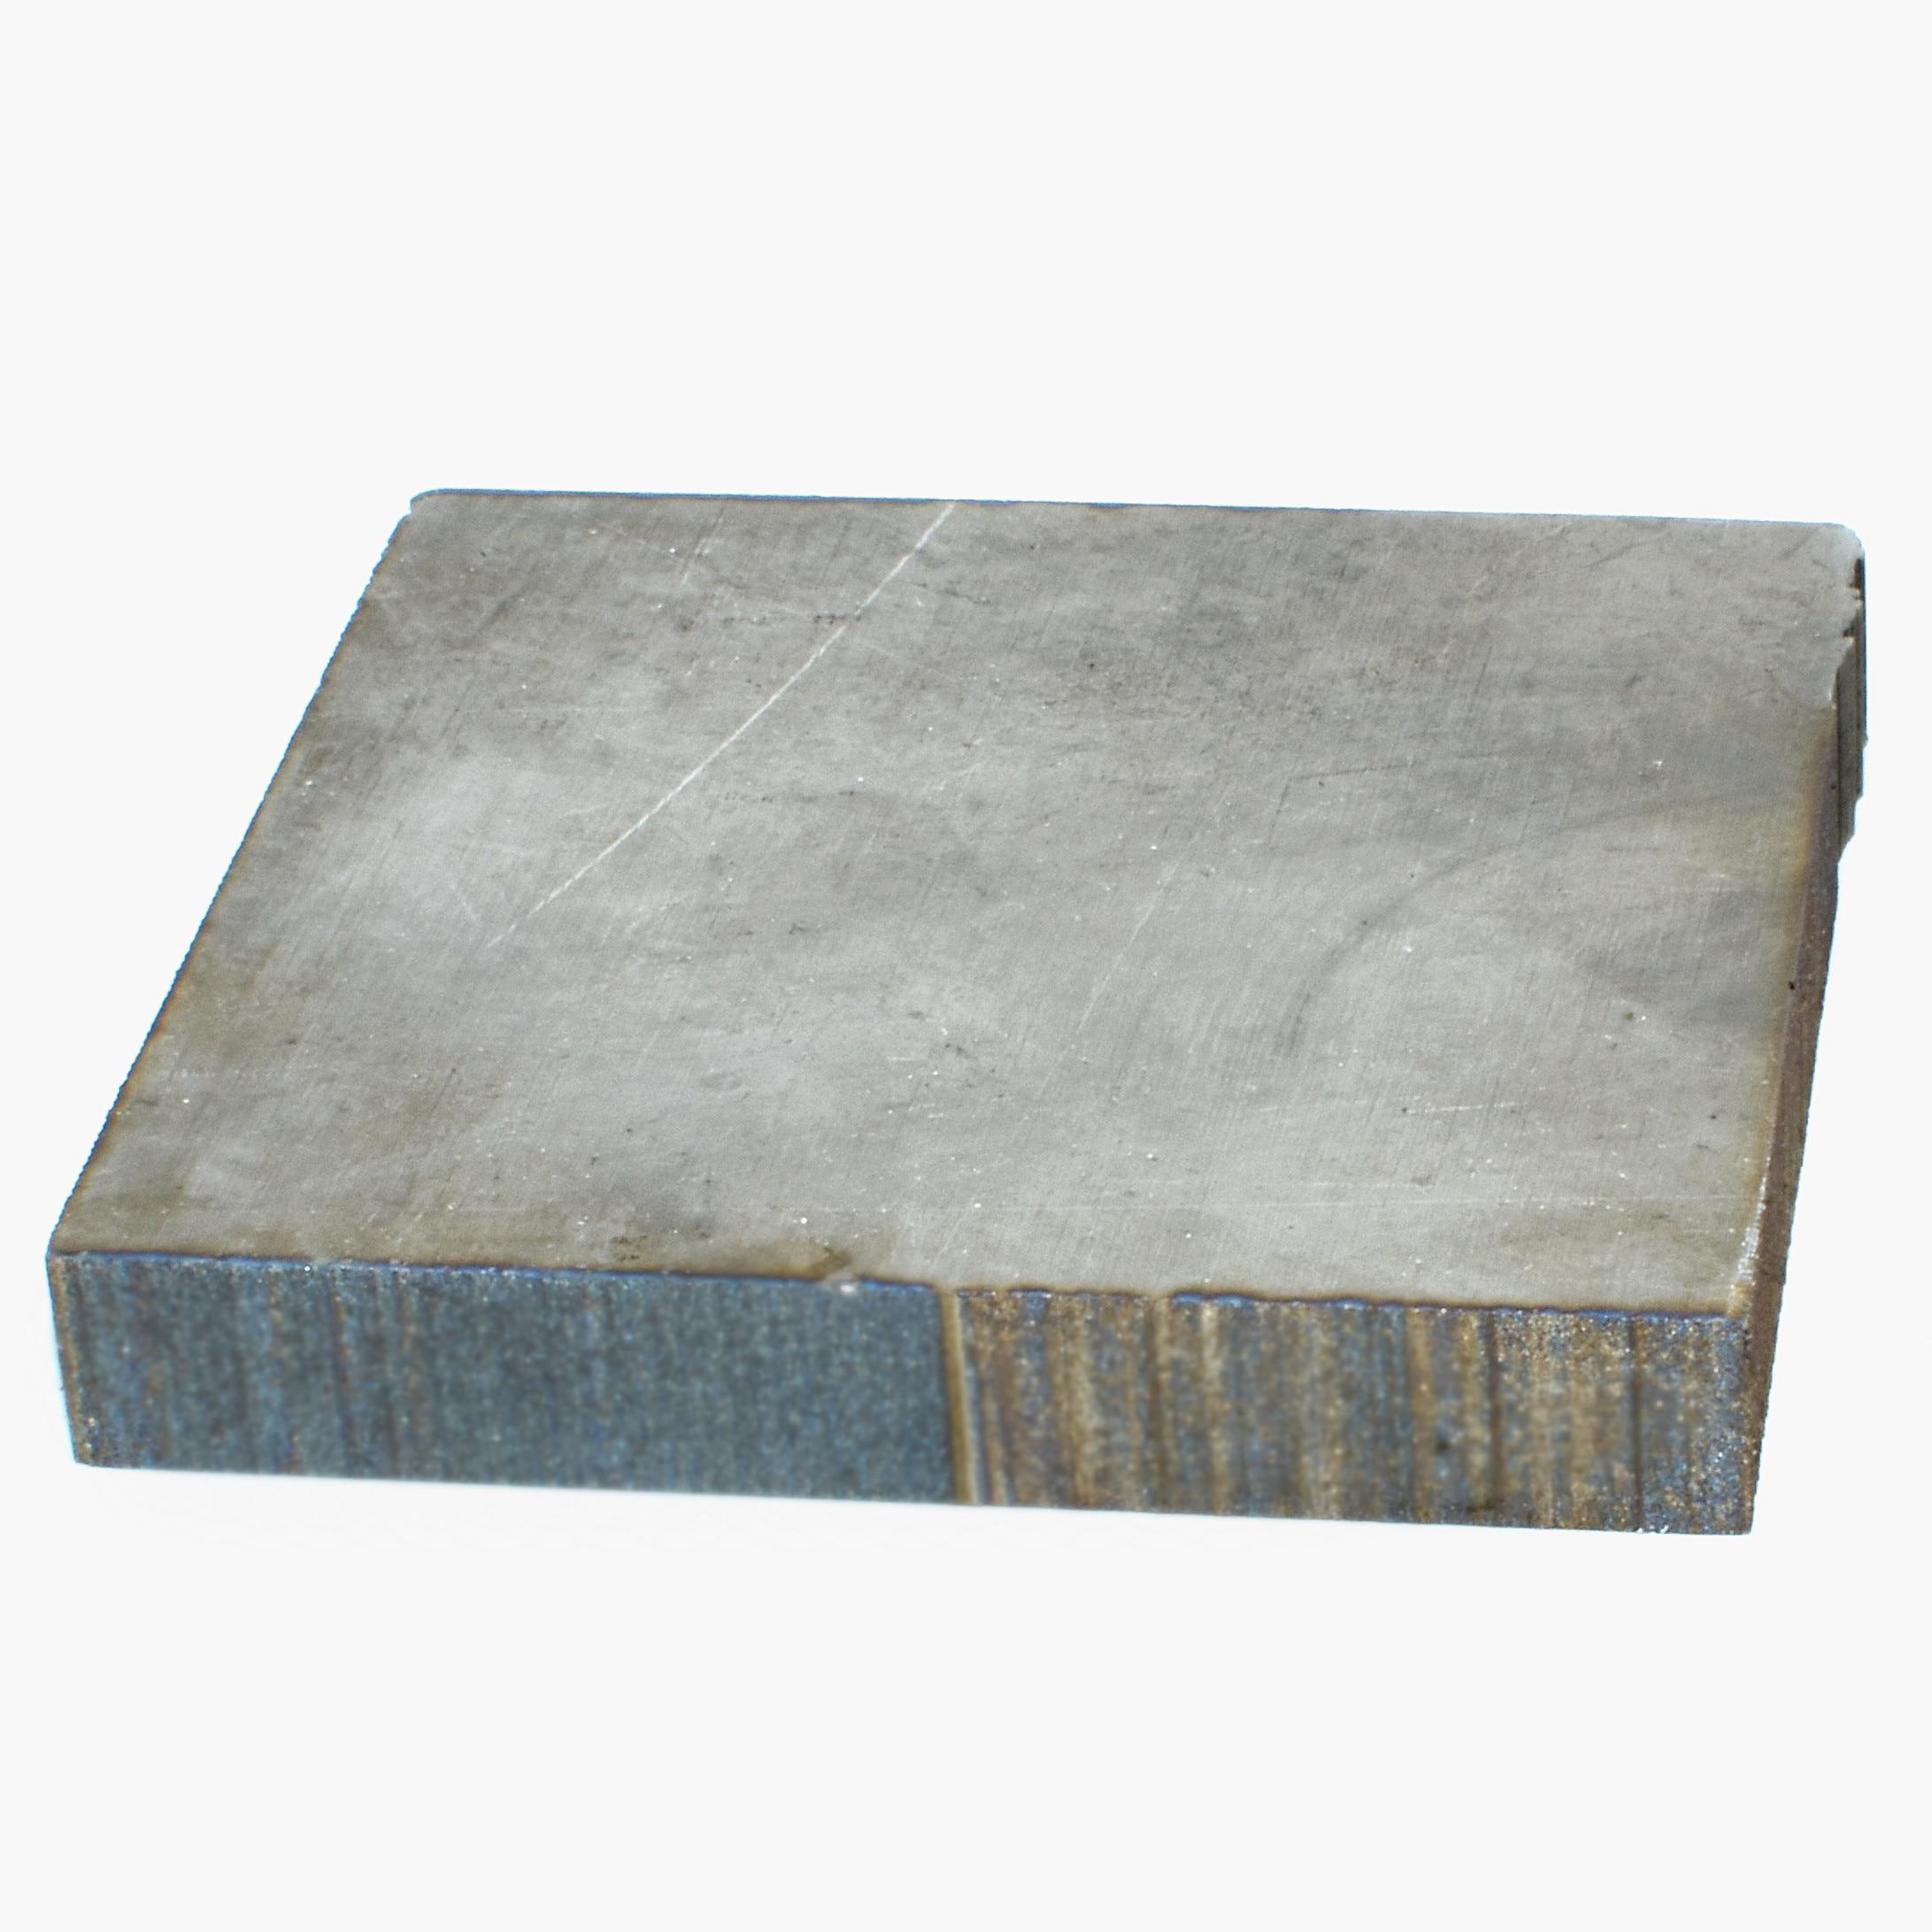 1 Pcs 100x100X0.8 1 2 4 5 6 8 10 15 20mm TC4 Ti Titanium Sheet Grade 5 Titanium Plate Gr.5 Gr.5 Titanium Plate Industry Or DIY